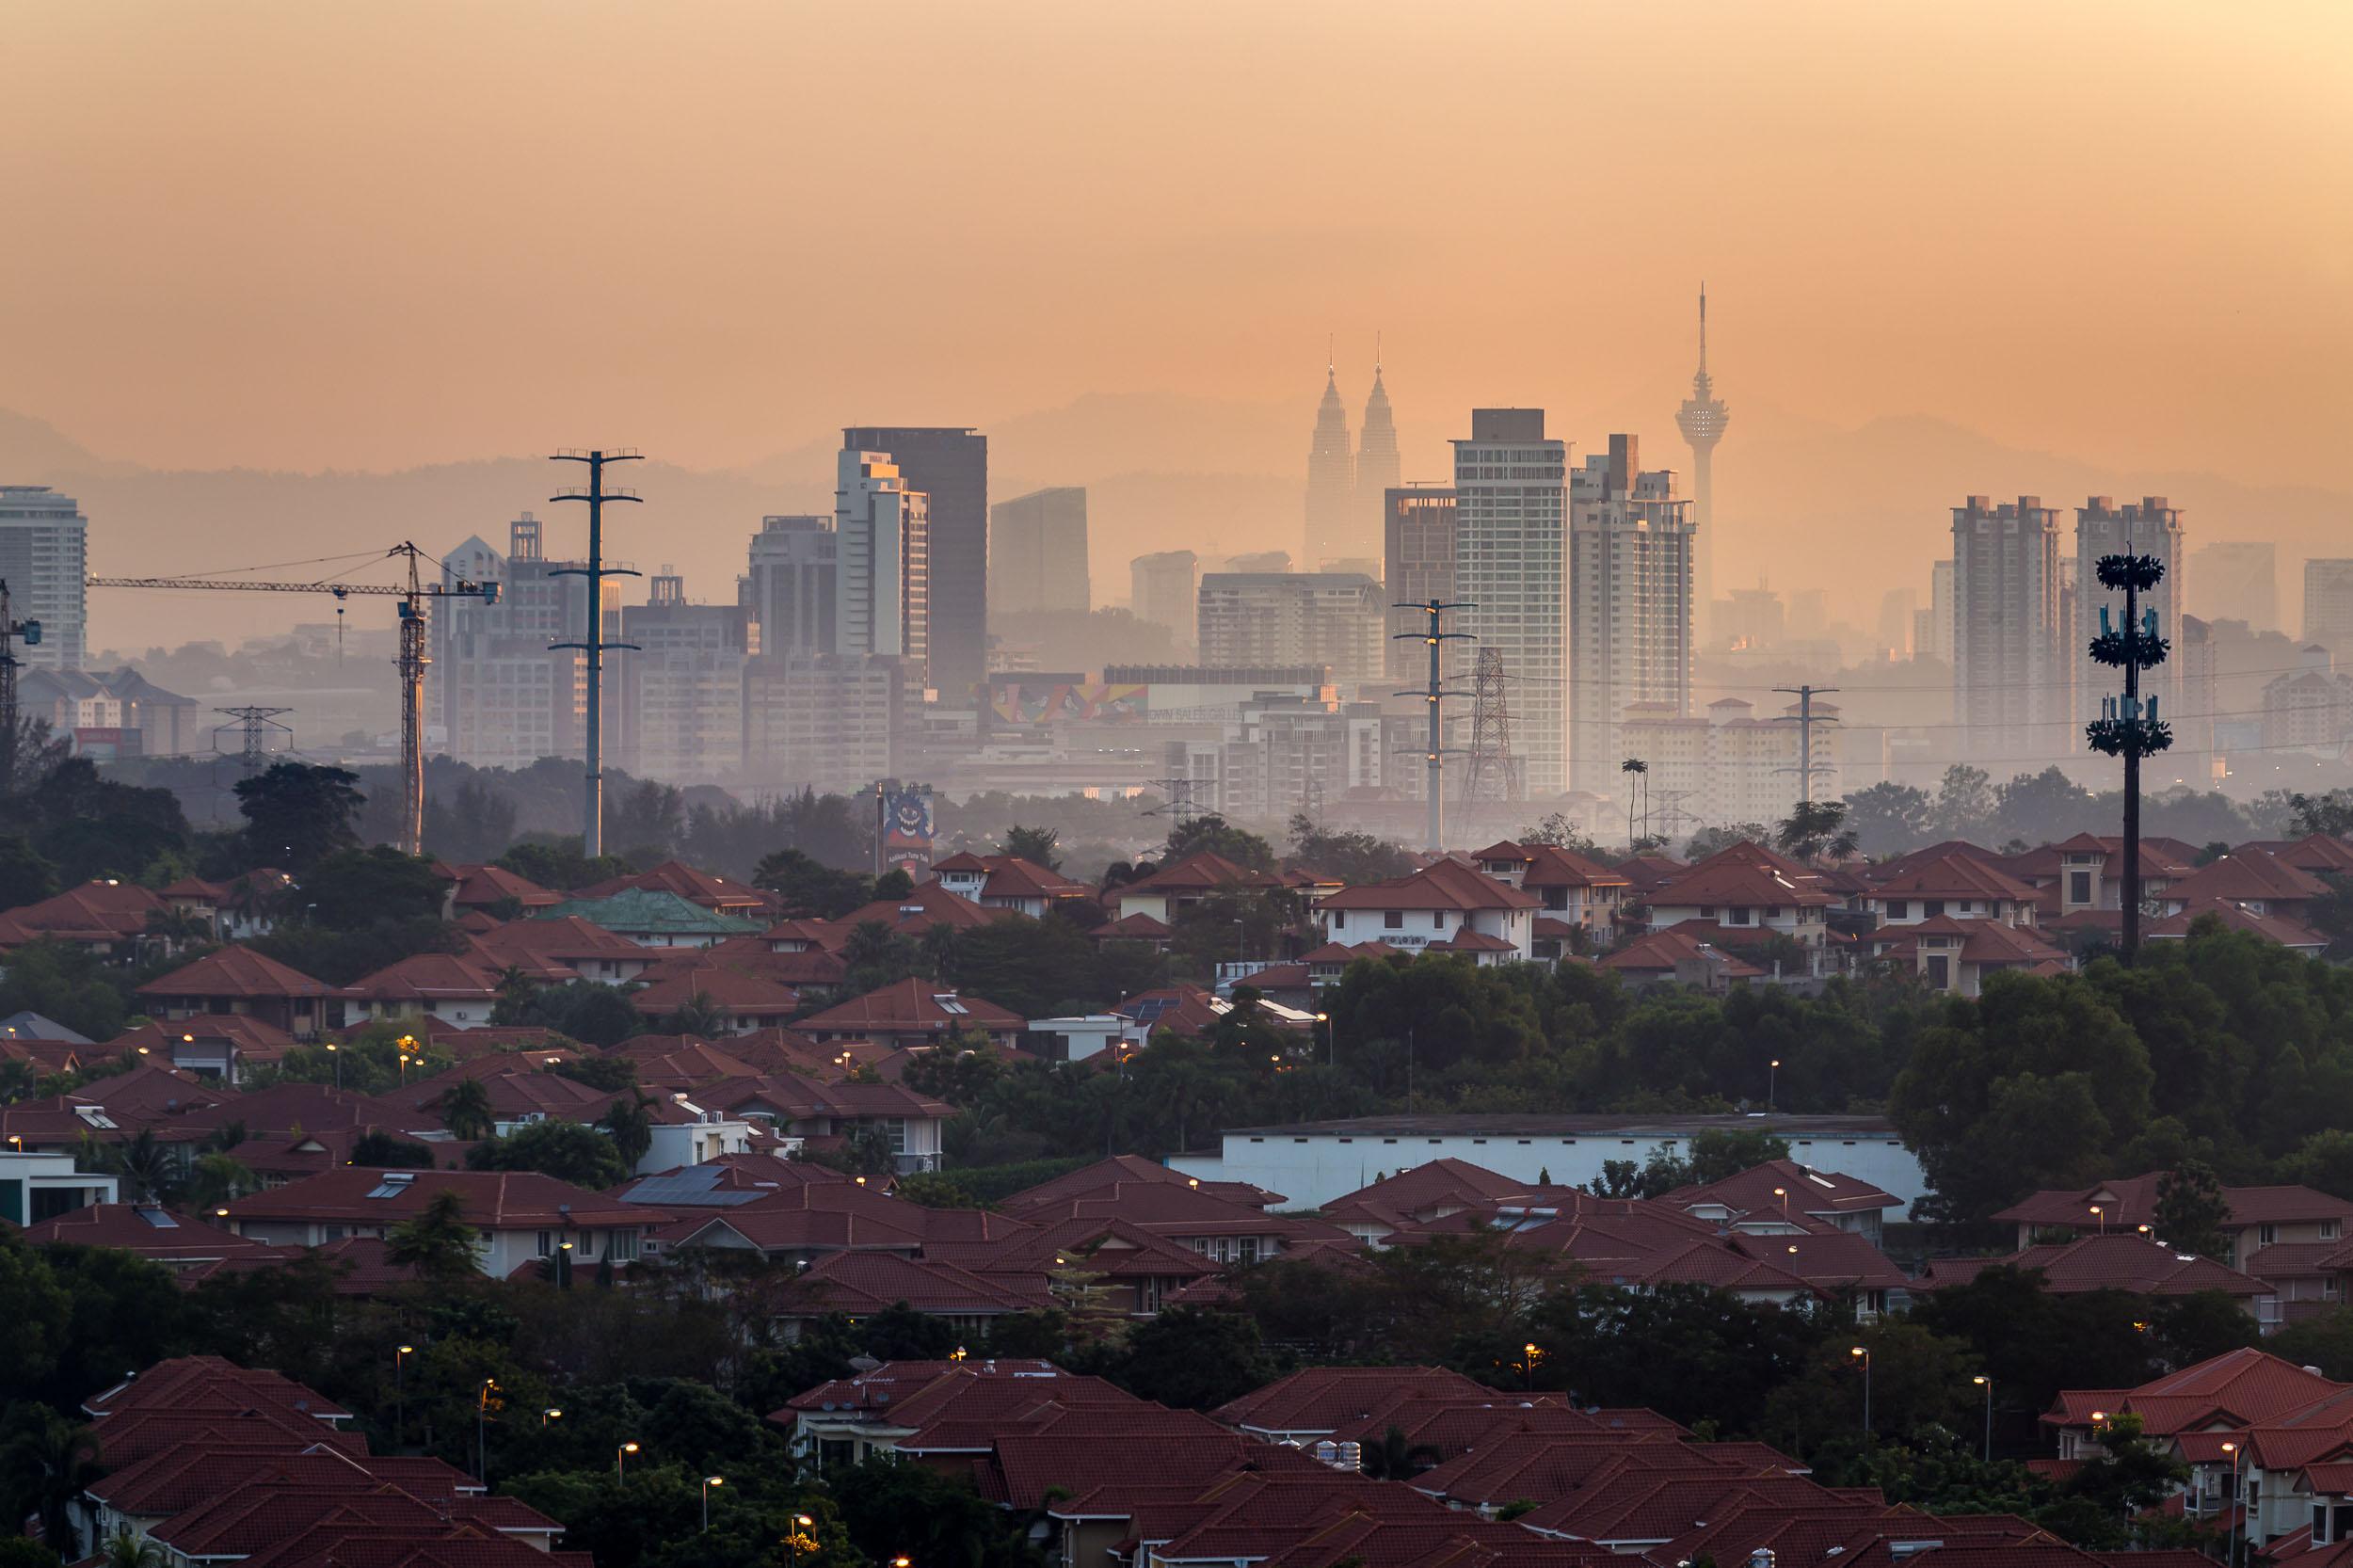 malaysia kuala lumpur sunrise haze inner city orange cityscape travel.jpg